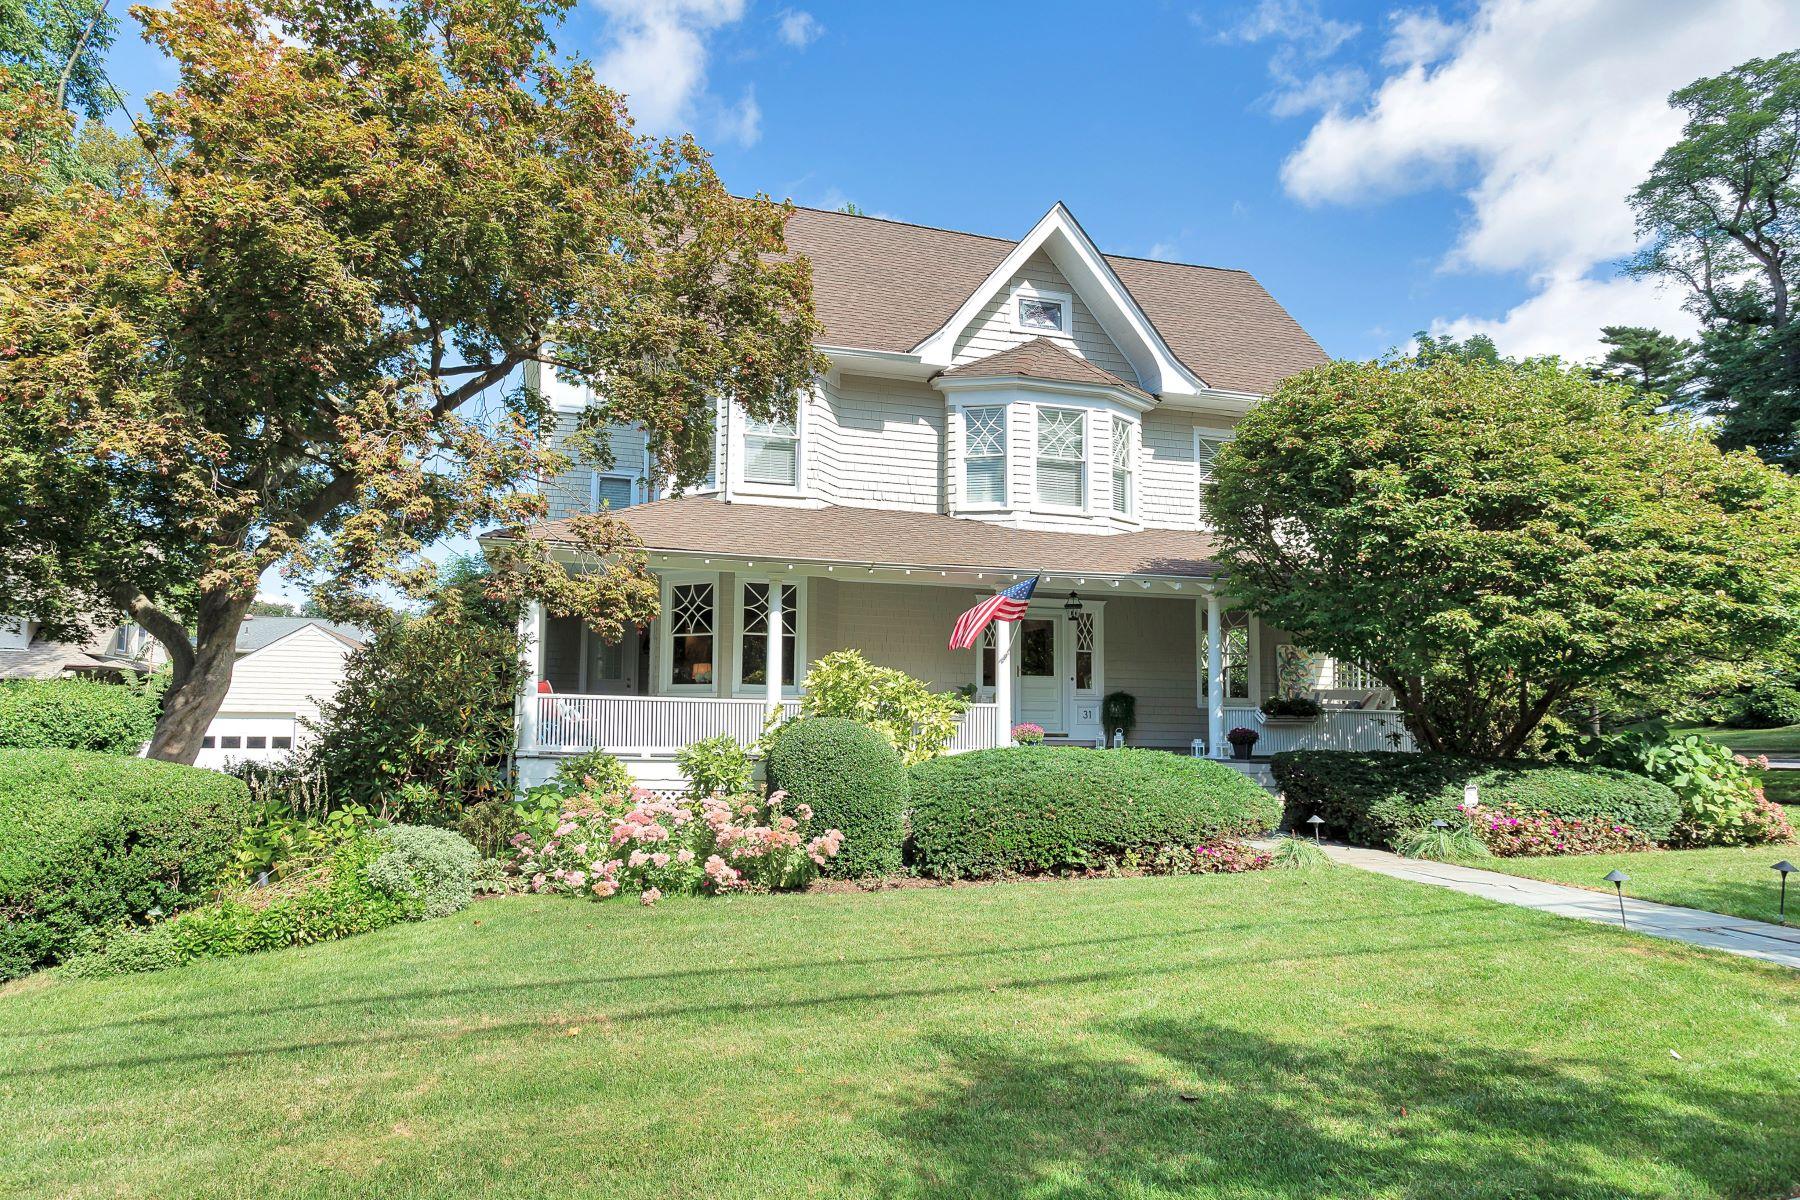 Single Family Homes for Active at Port Washington 31 Reid Ave Port Washington, New York 11050 United States